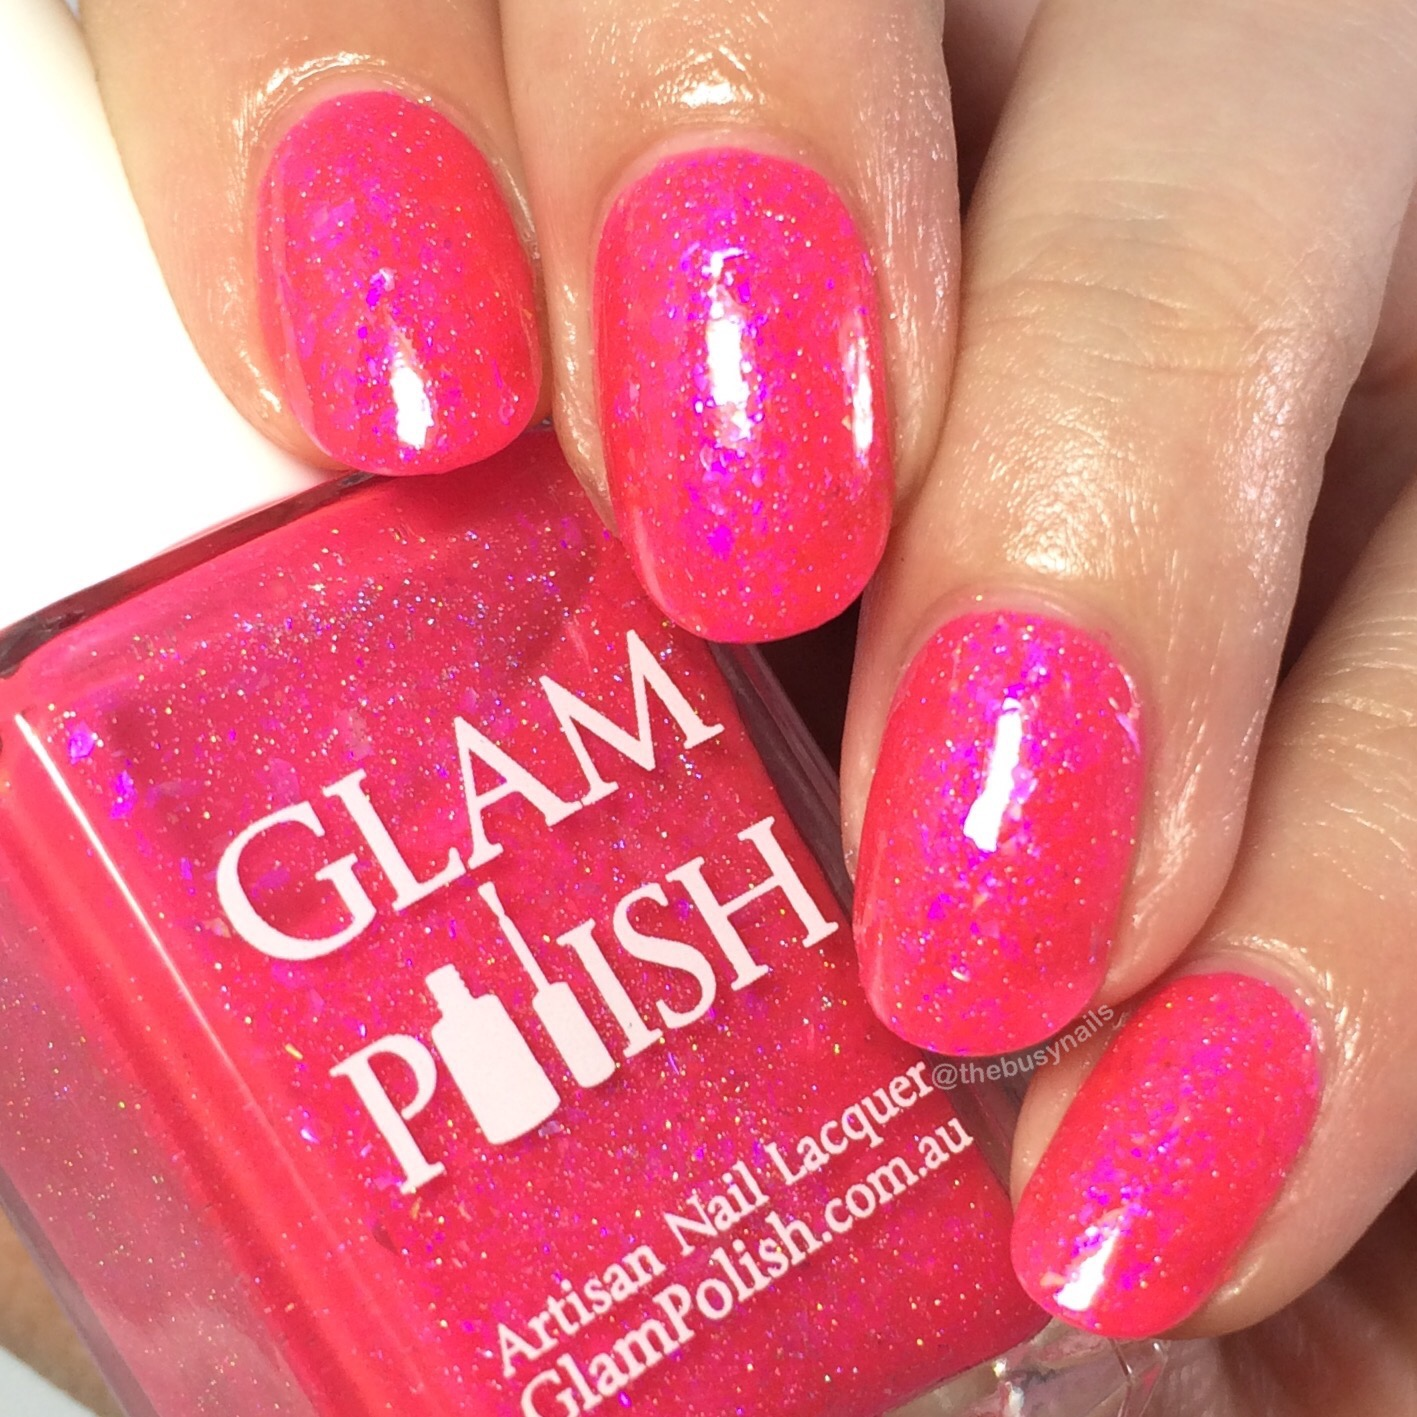 glam-polish-shore-thing.jpg